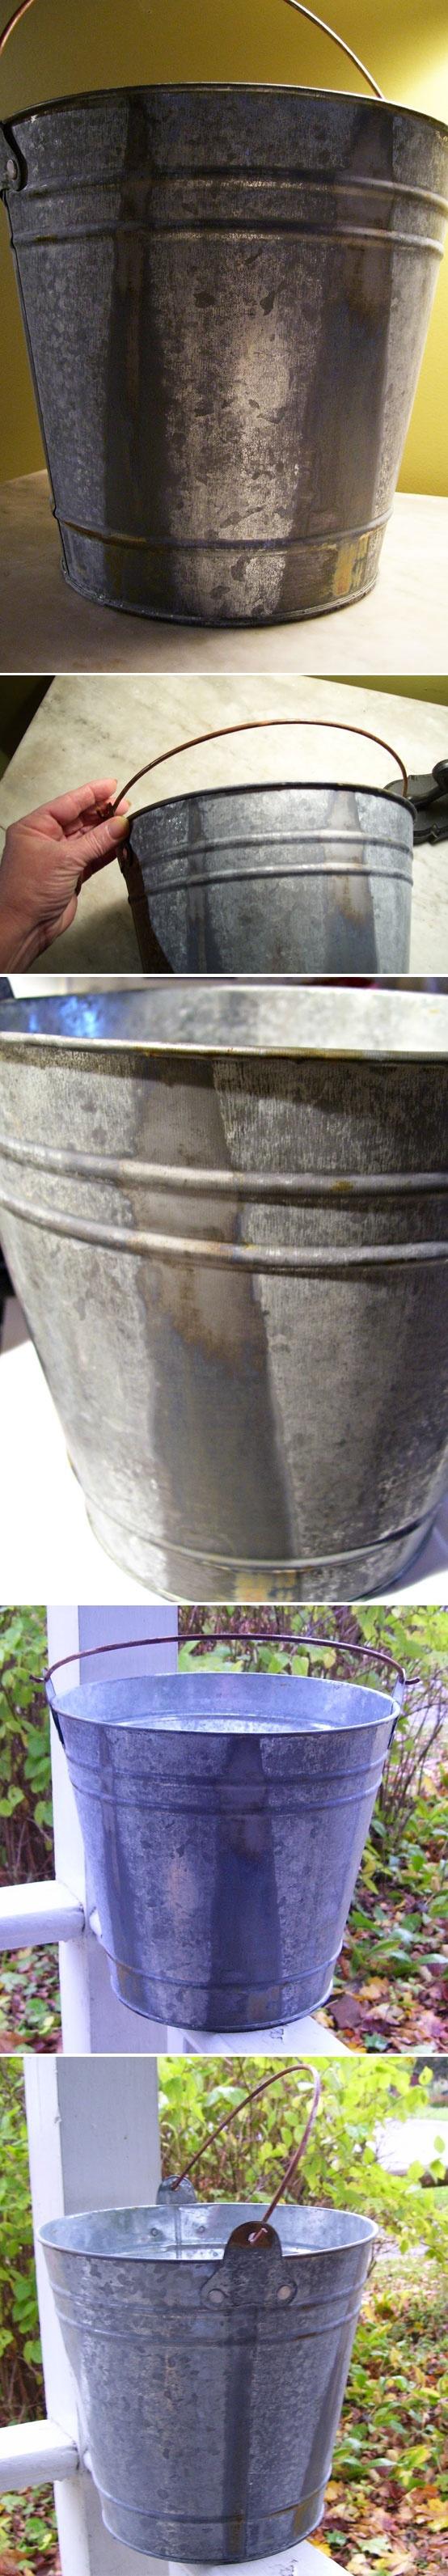 distressing metal how to patina a galvanized metal